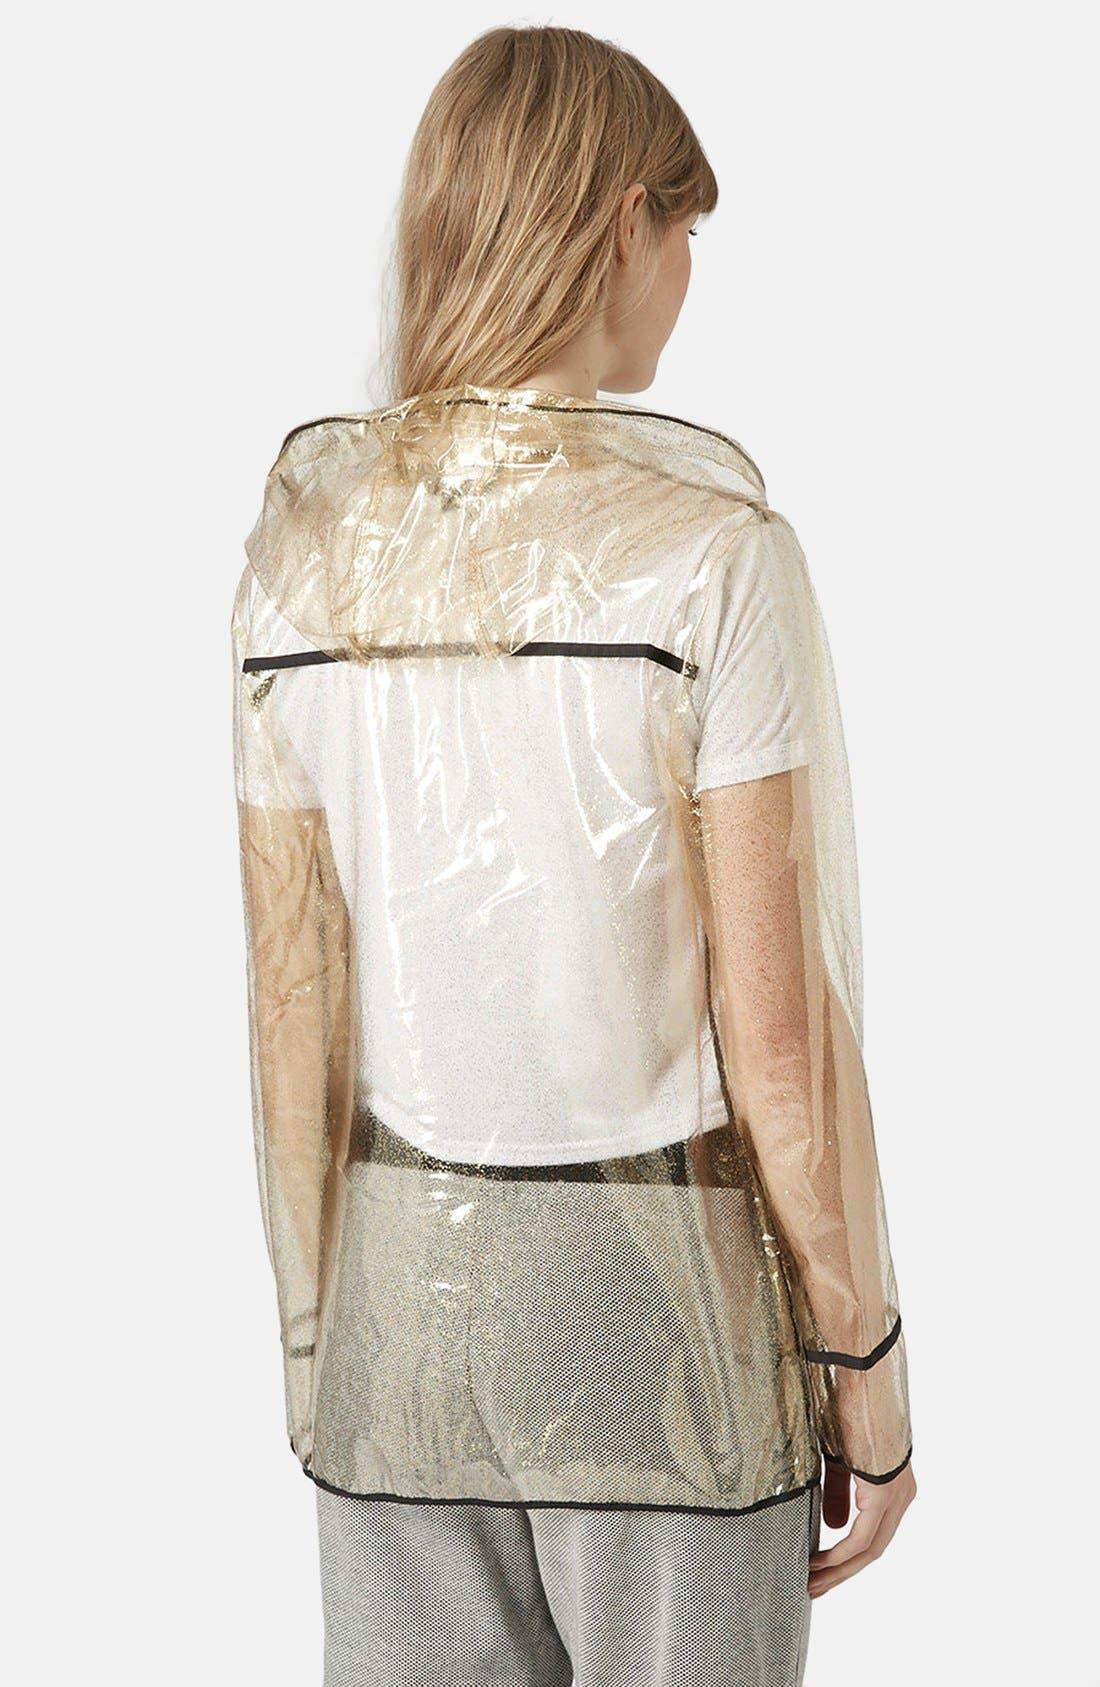 Gold Glitter Transparent Plastic Rain Jacket,                             Alternate thumbnail 2, color,                             Gold